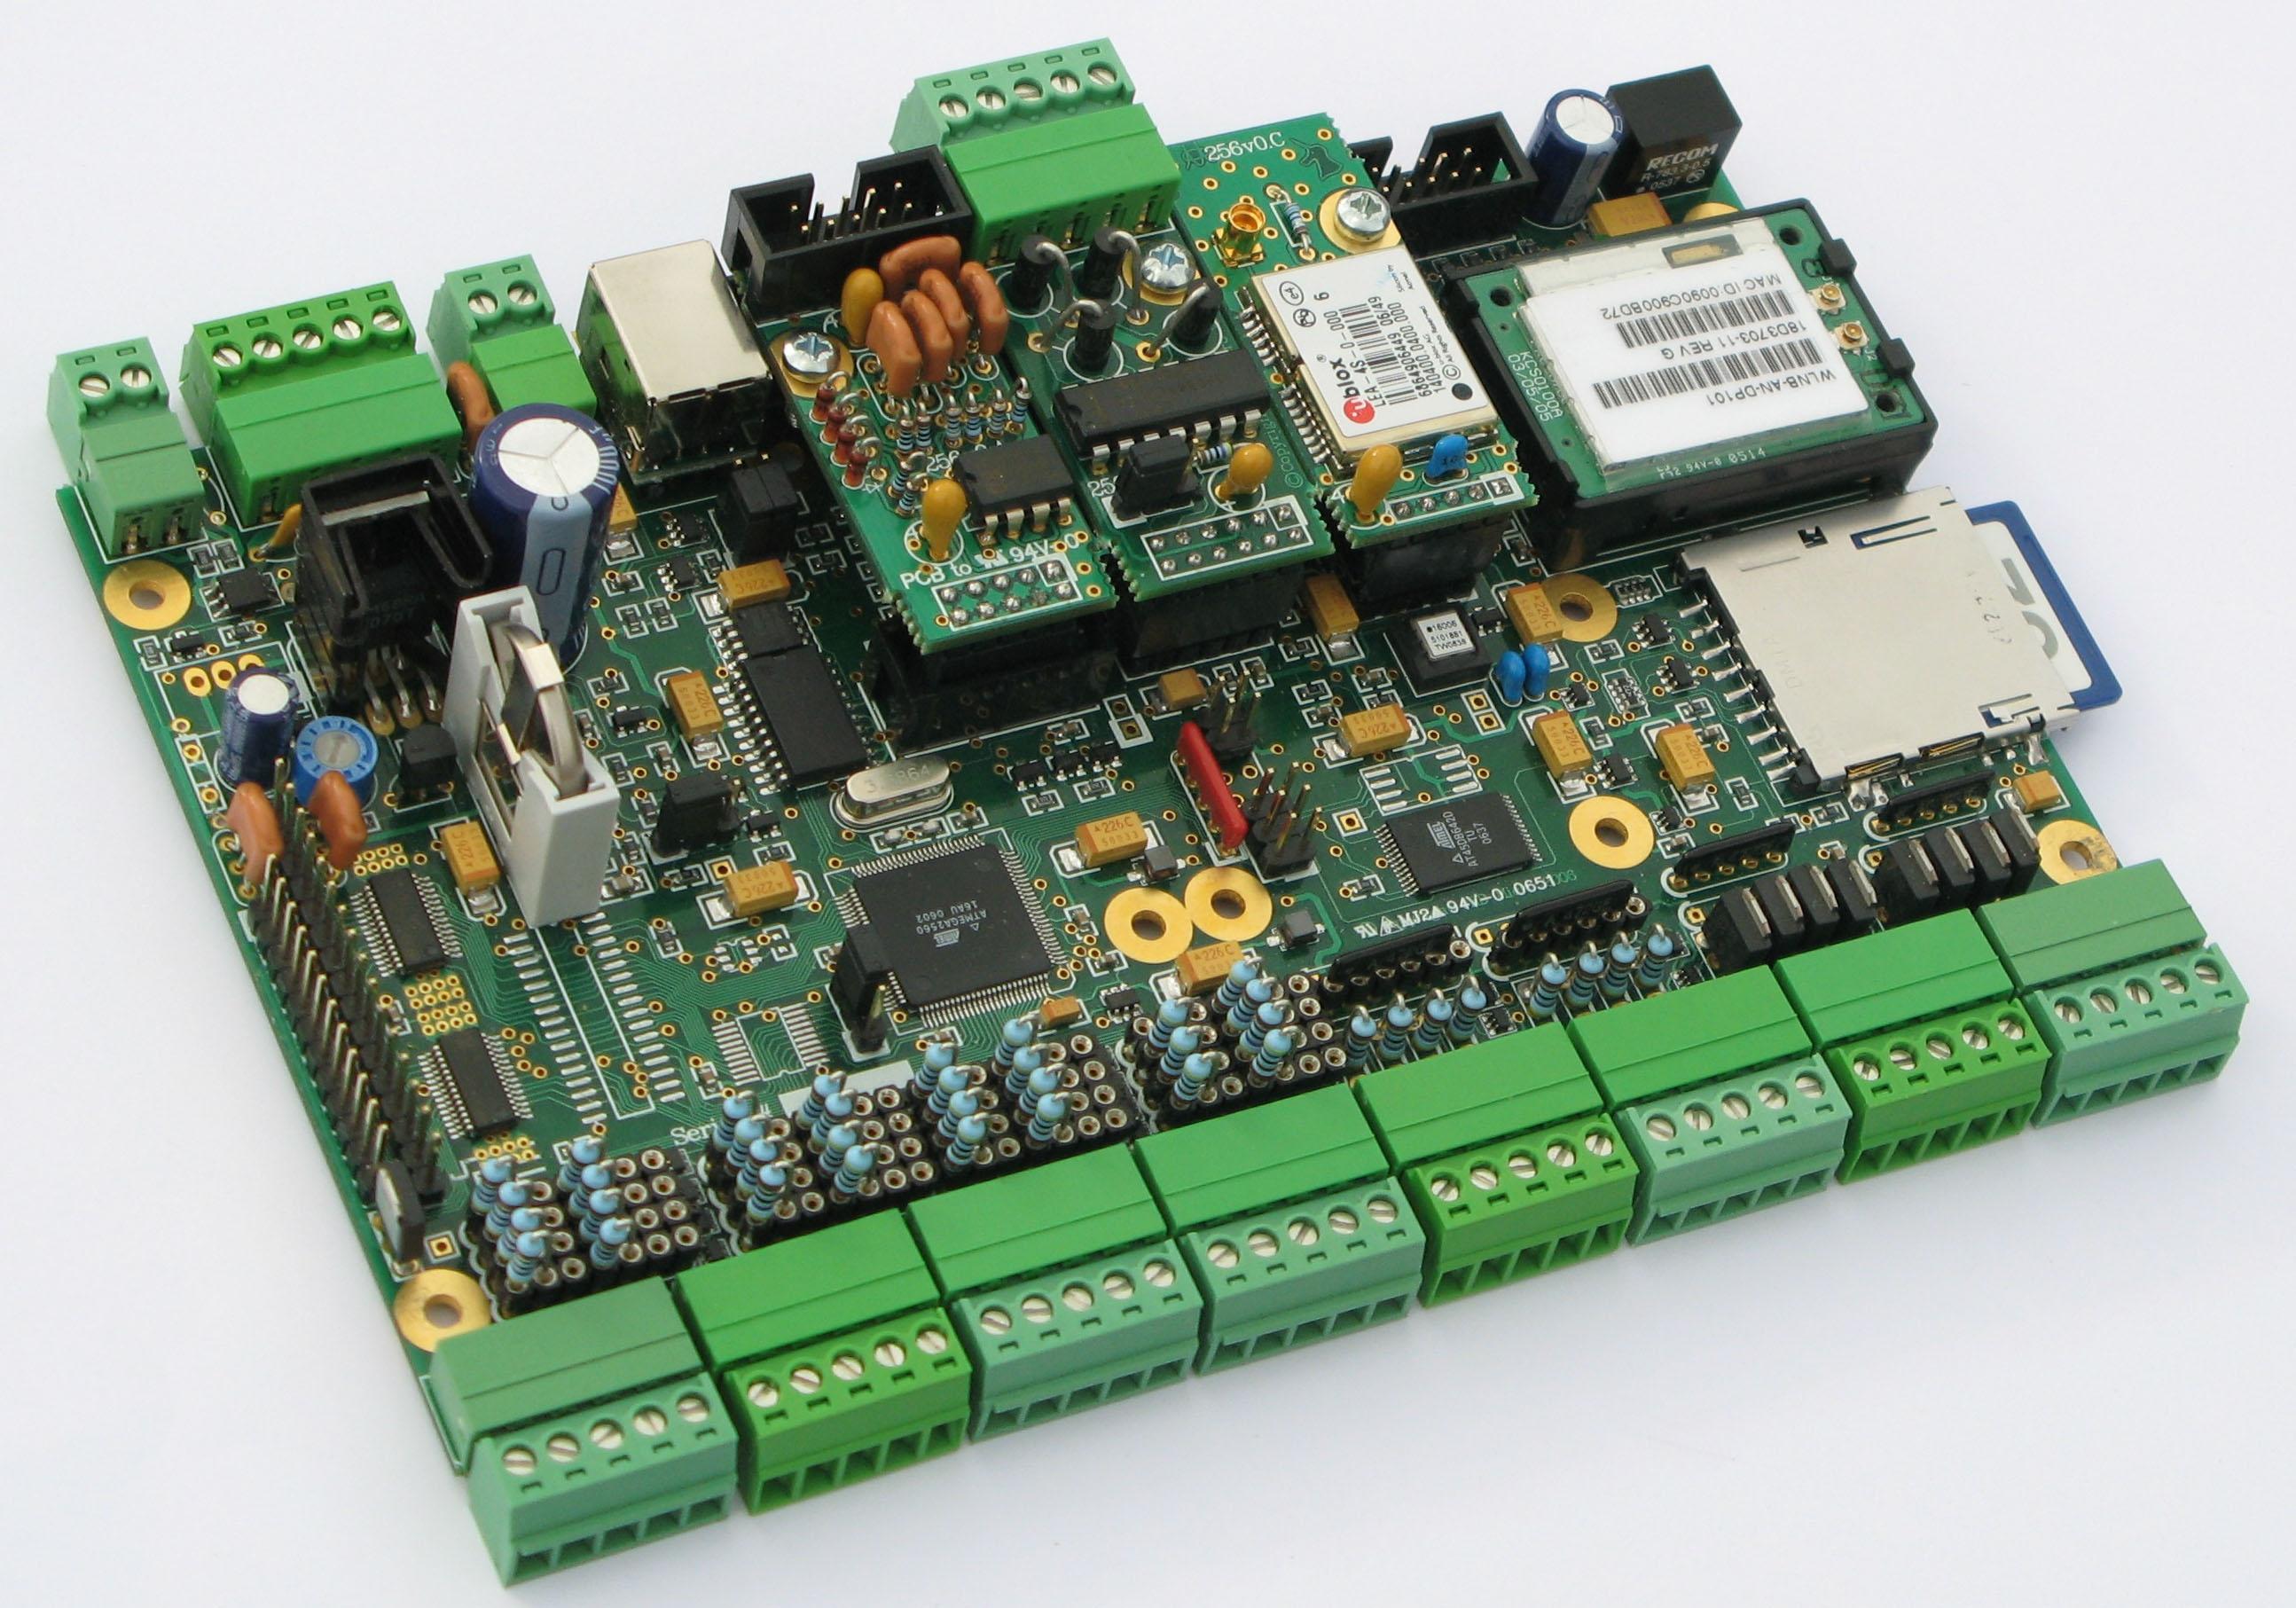 Jed Avr256 Single Board Computer Using The Atmega2560 Atmel Avr Mcu Family Expanded